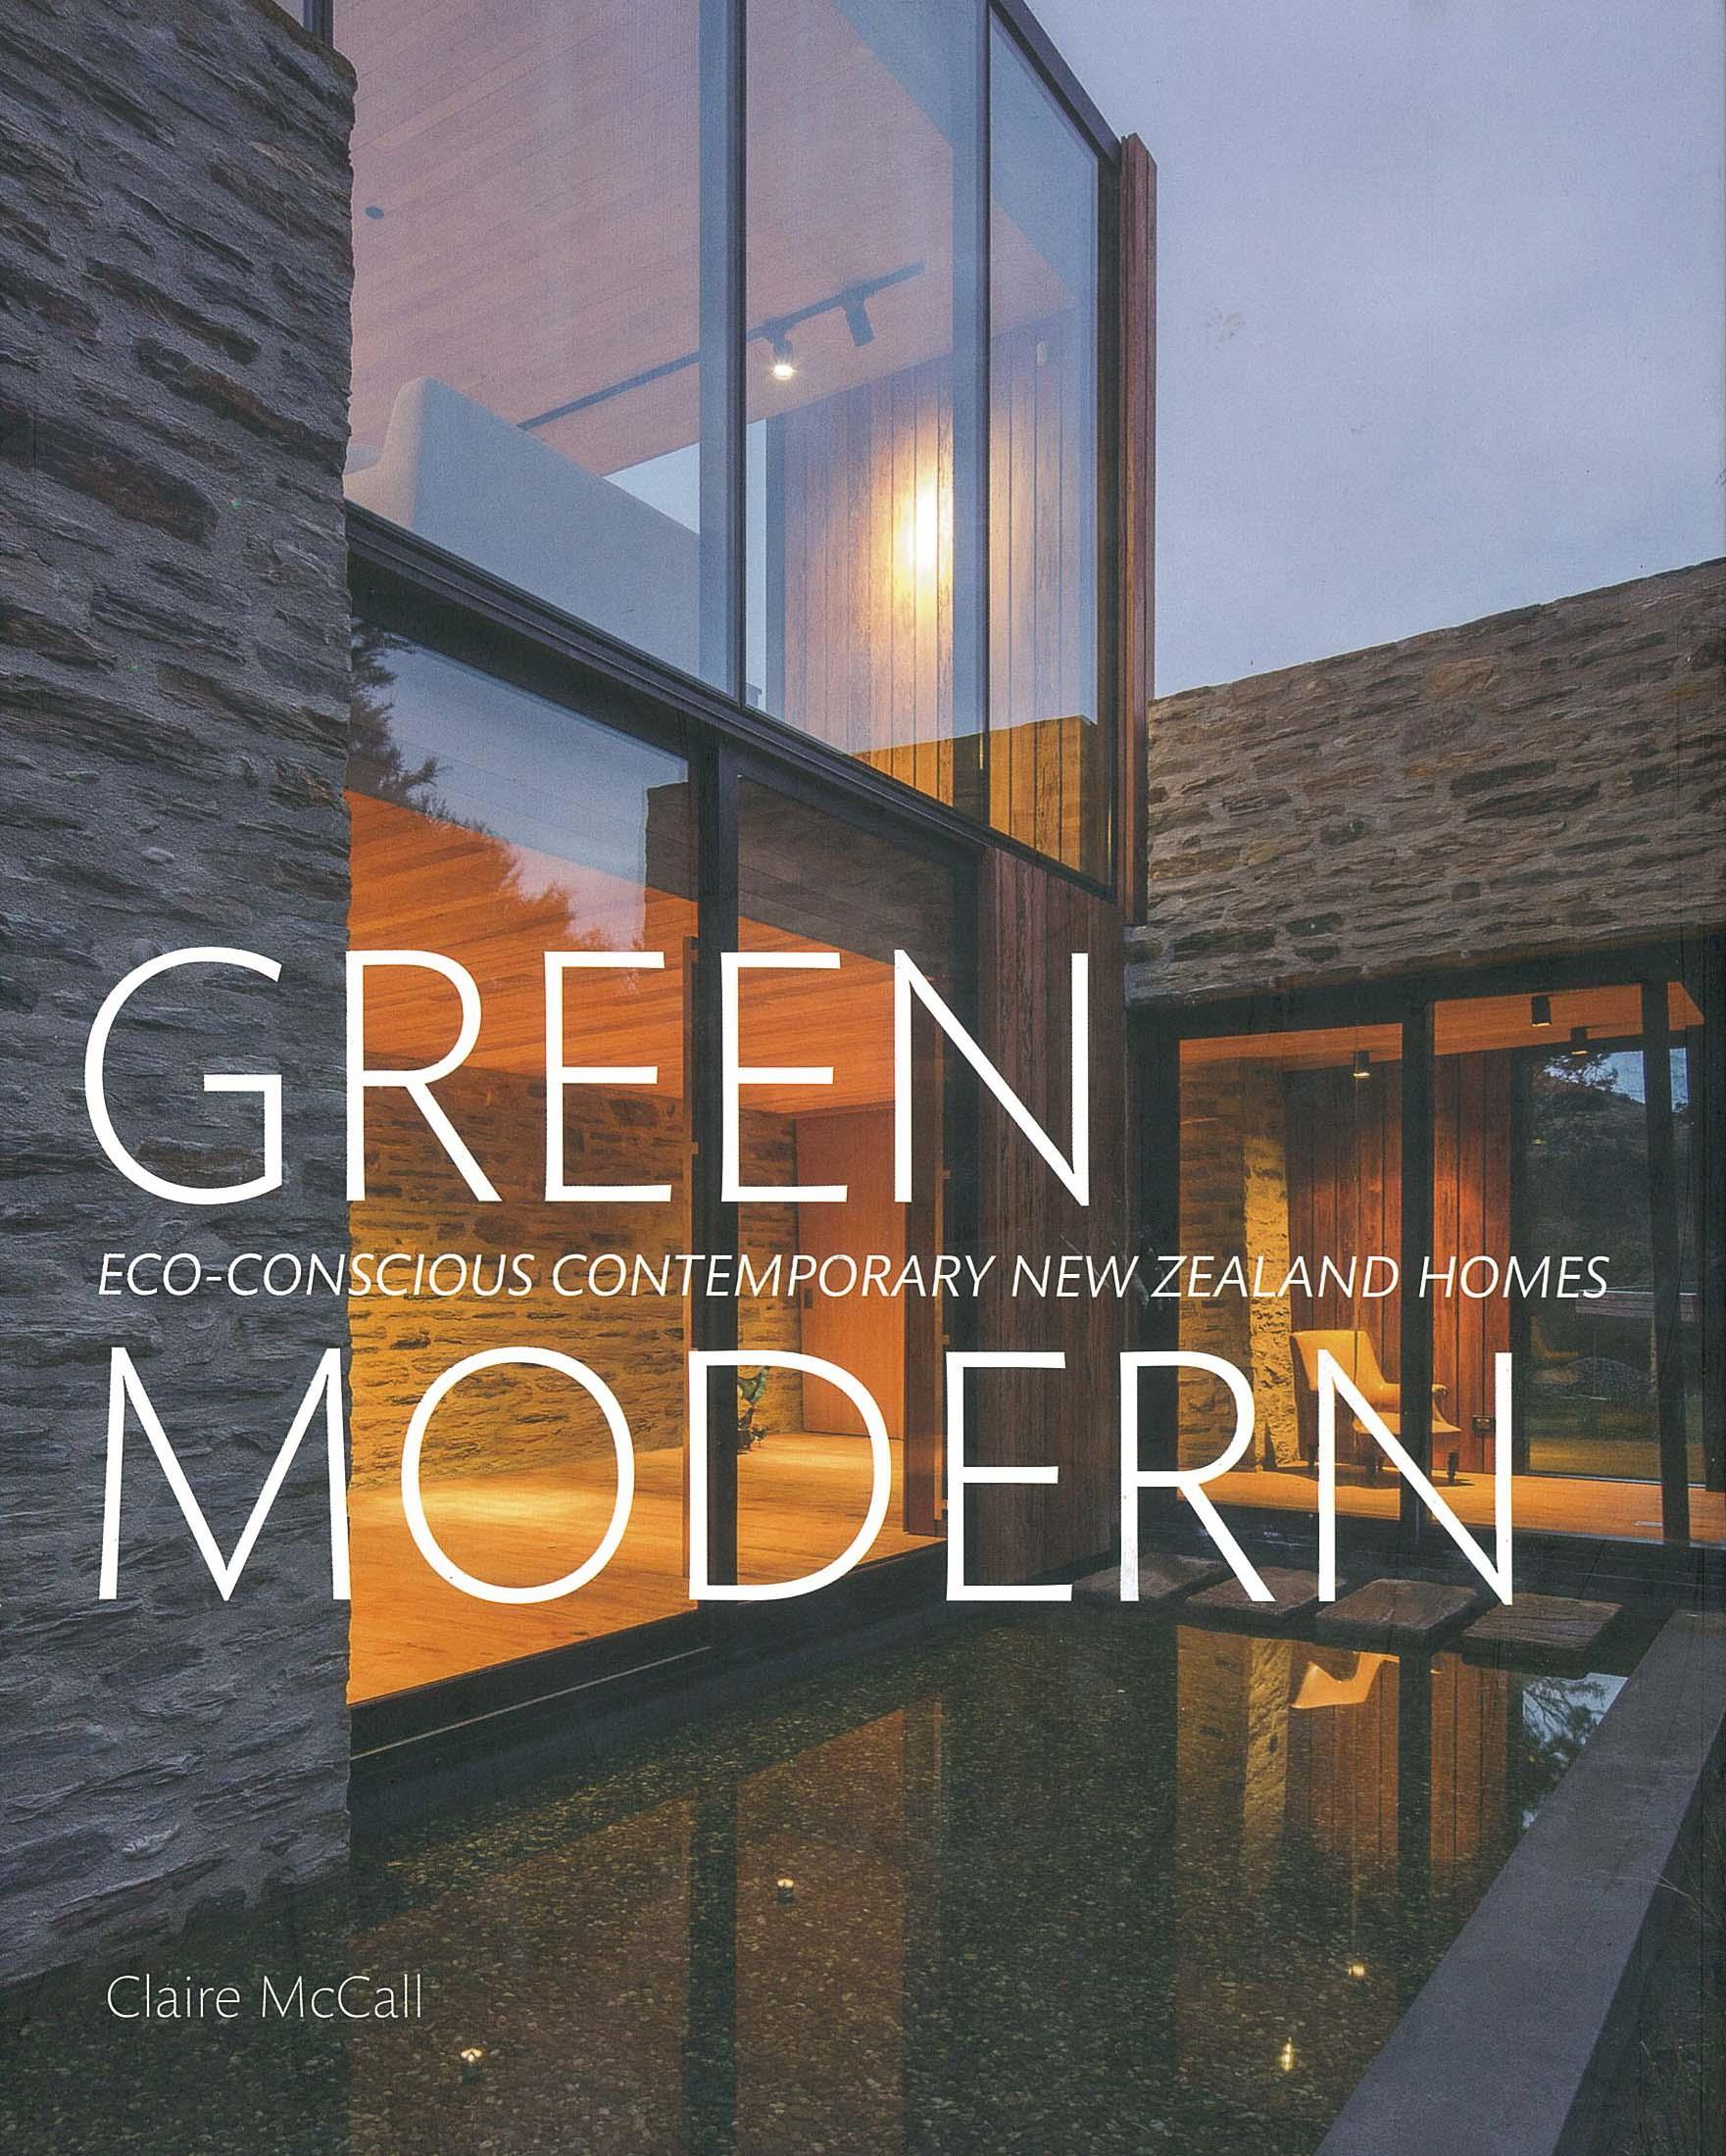 green Modern cover.jpg